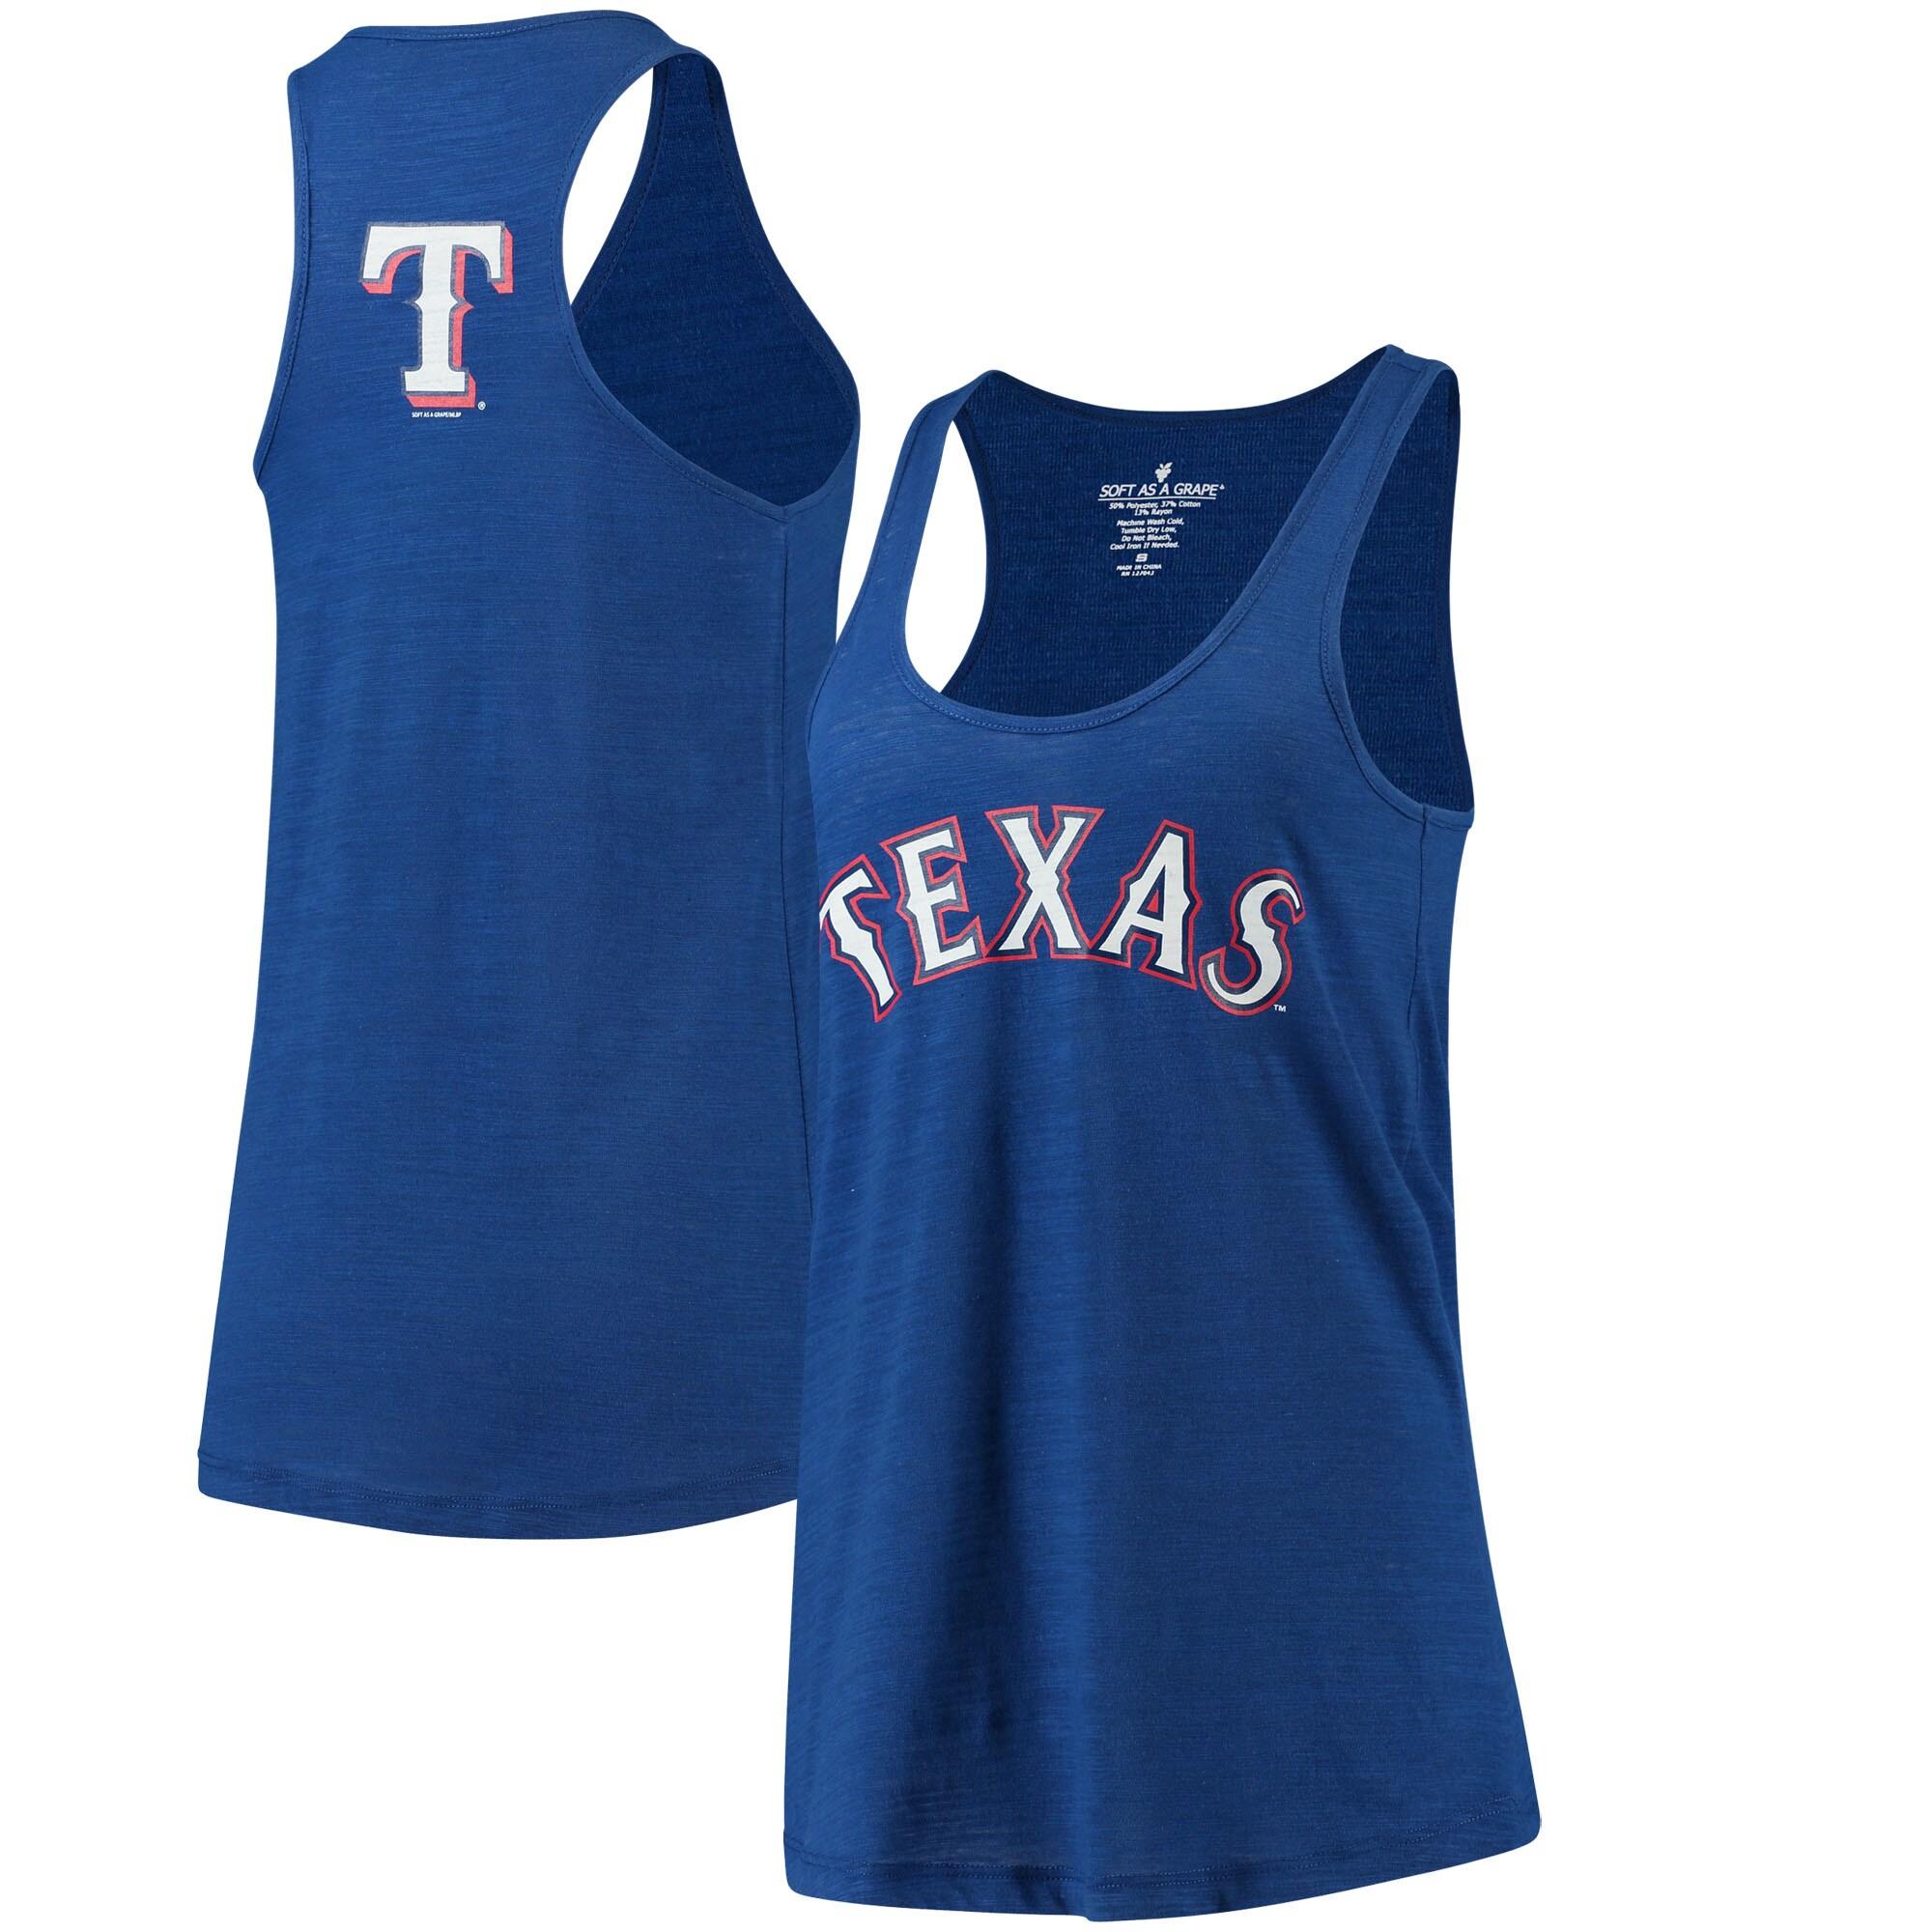 Texas Rangers Soft As A Grape Women's Front & Back Tri-Blend Racerback Tank Top - Royal